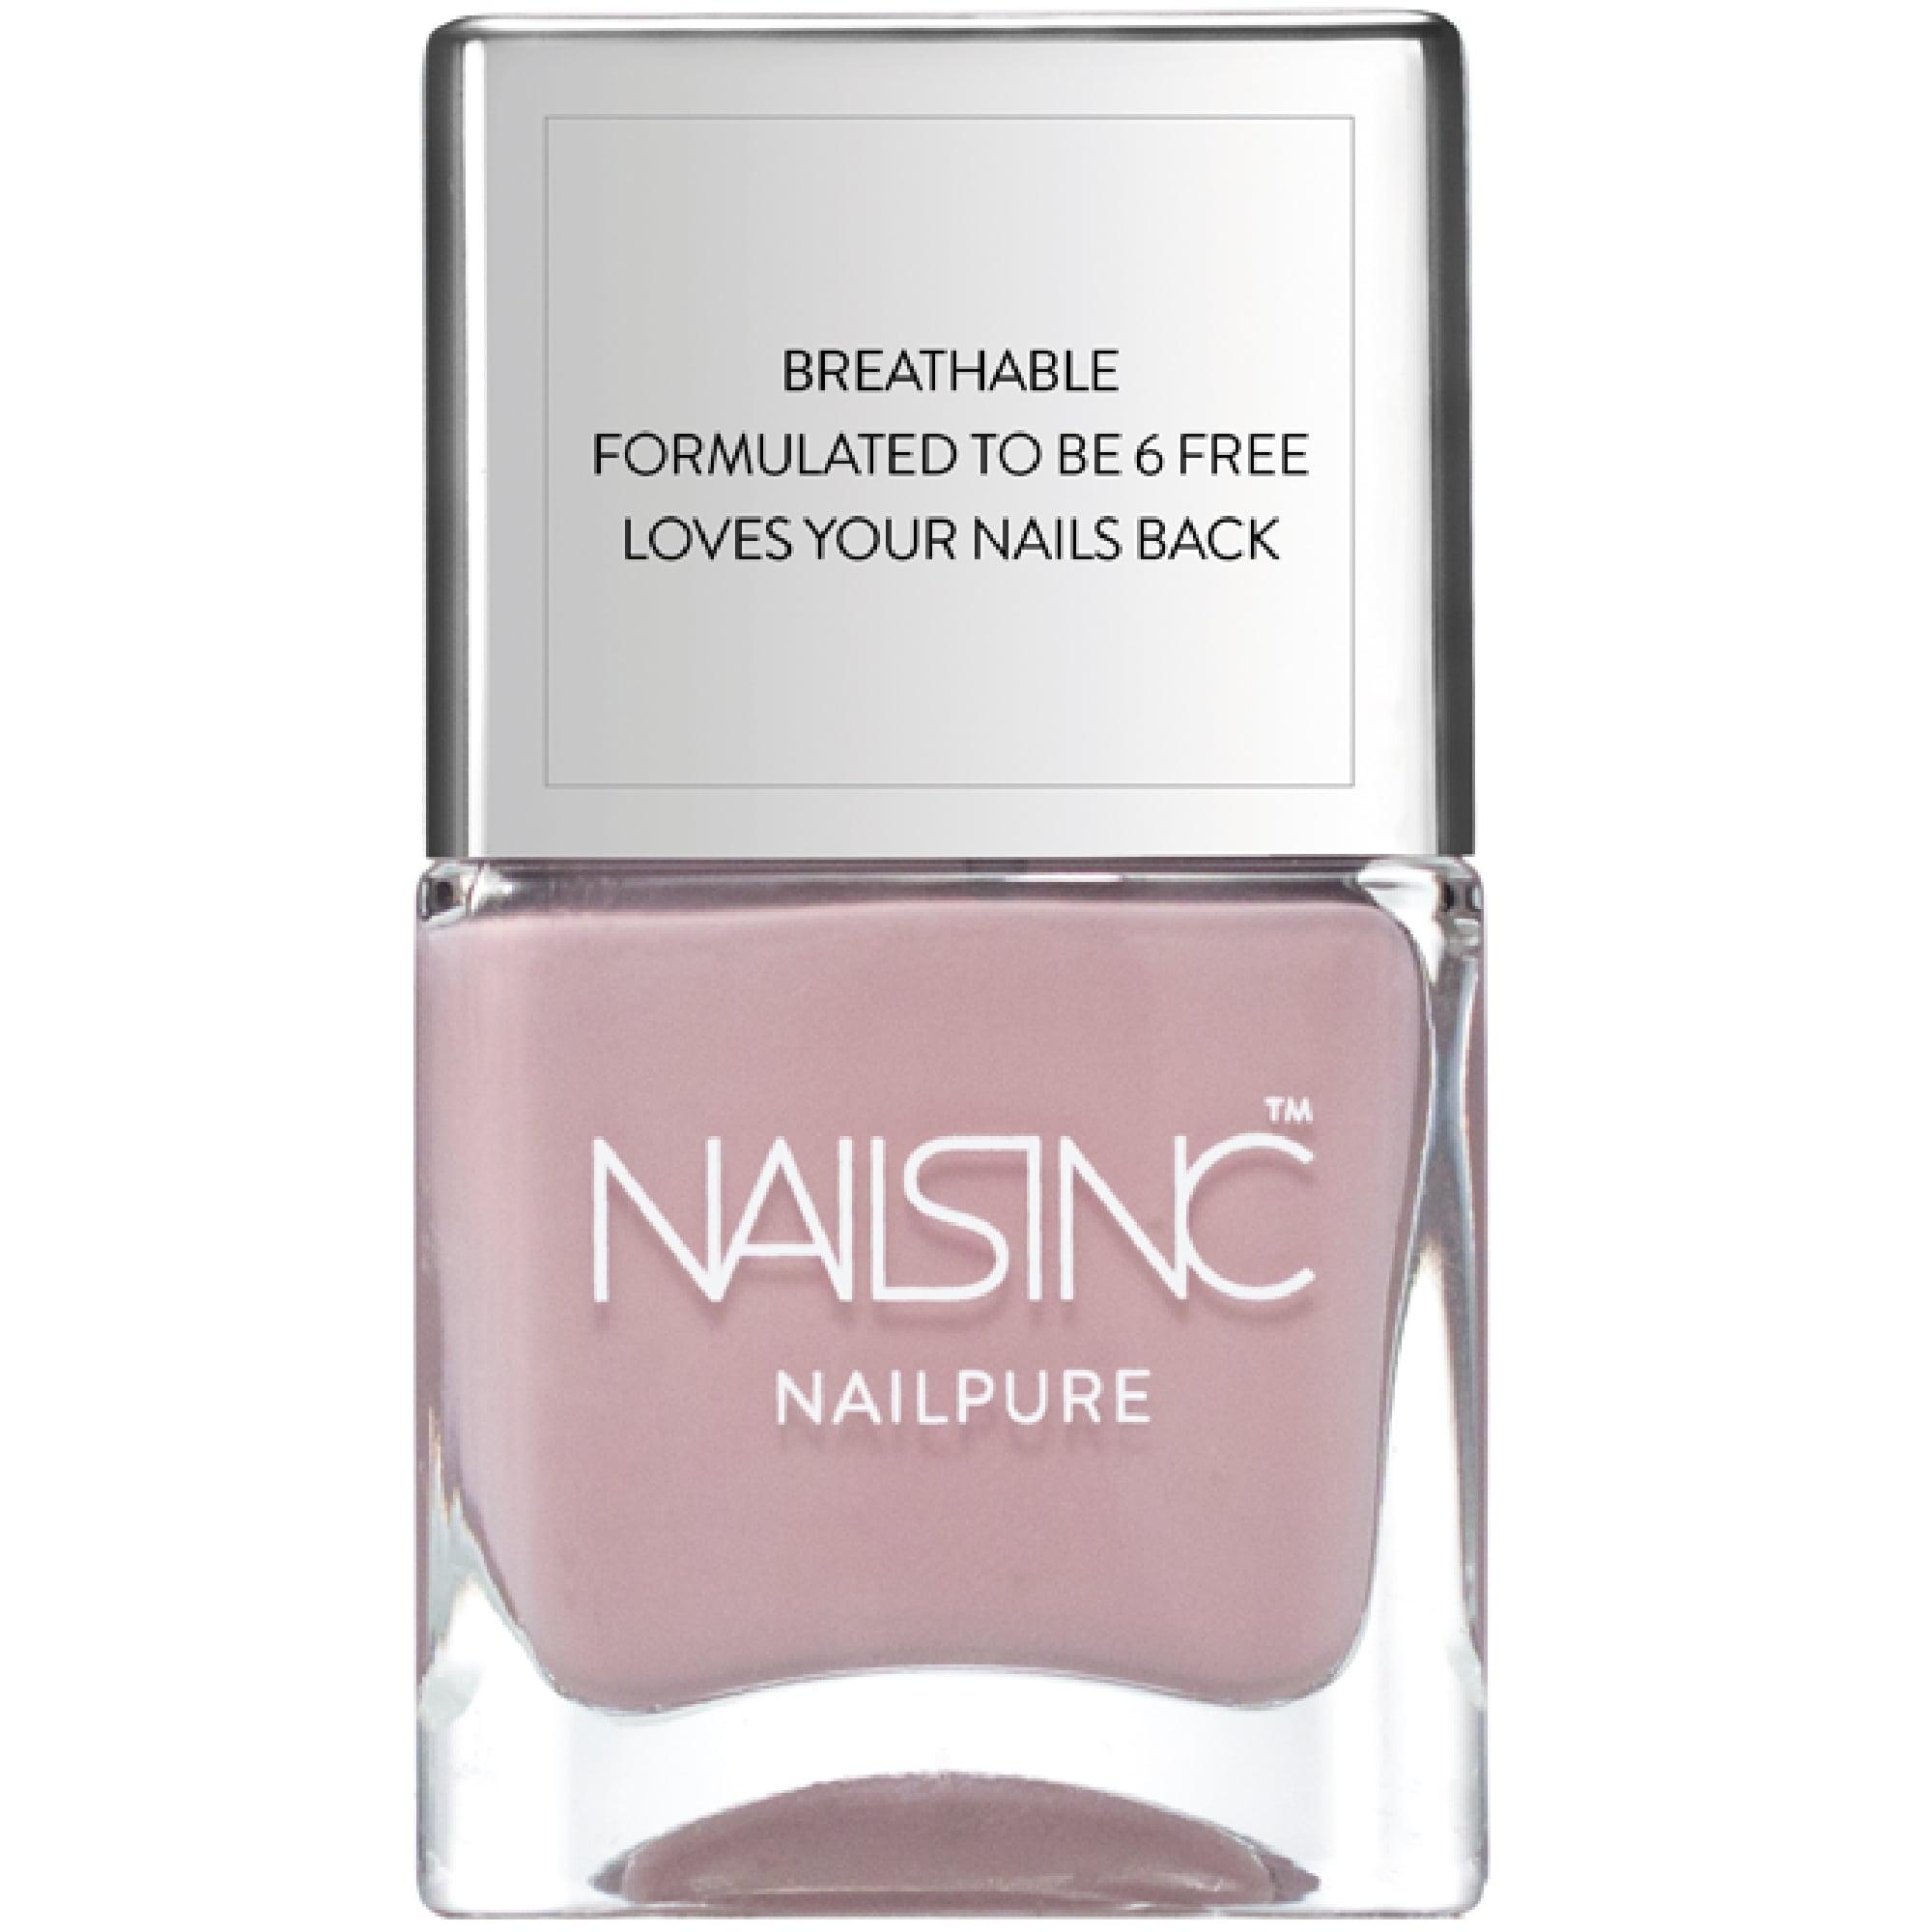 NAILSINC Nailpure 14ml Bond Street